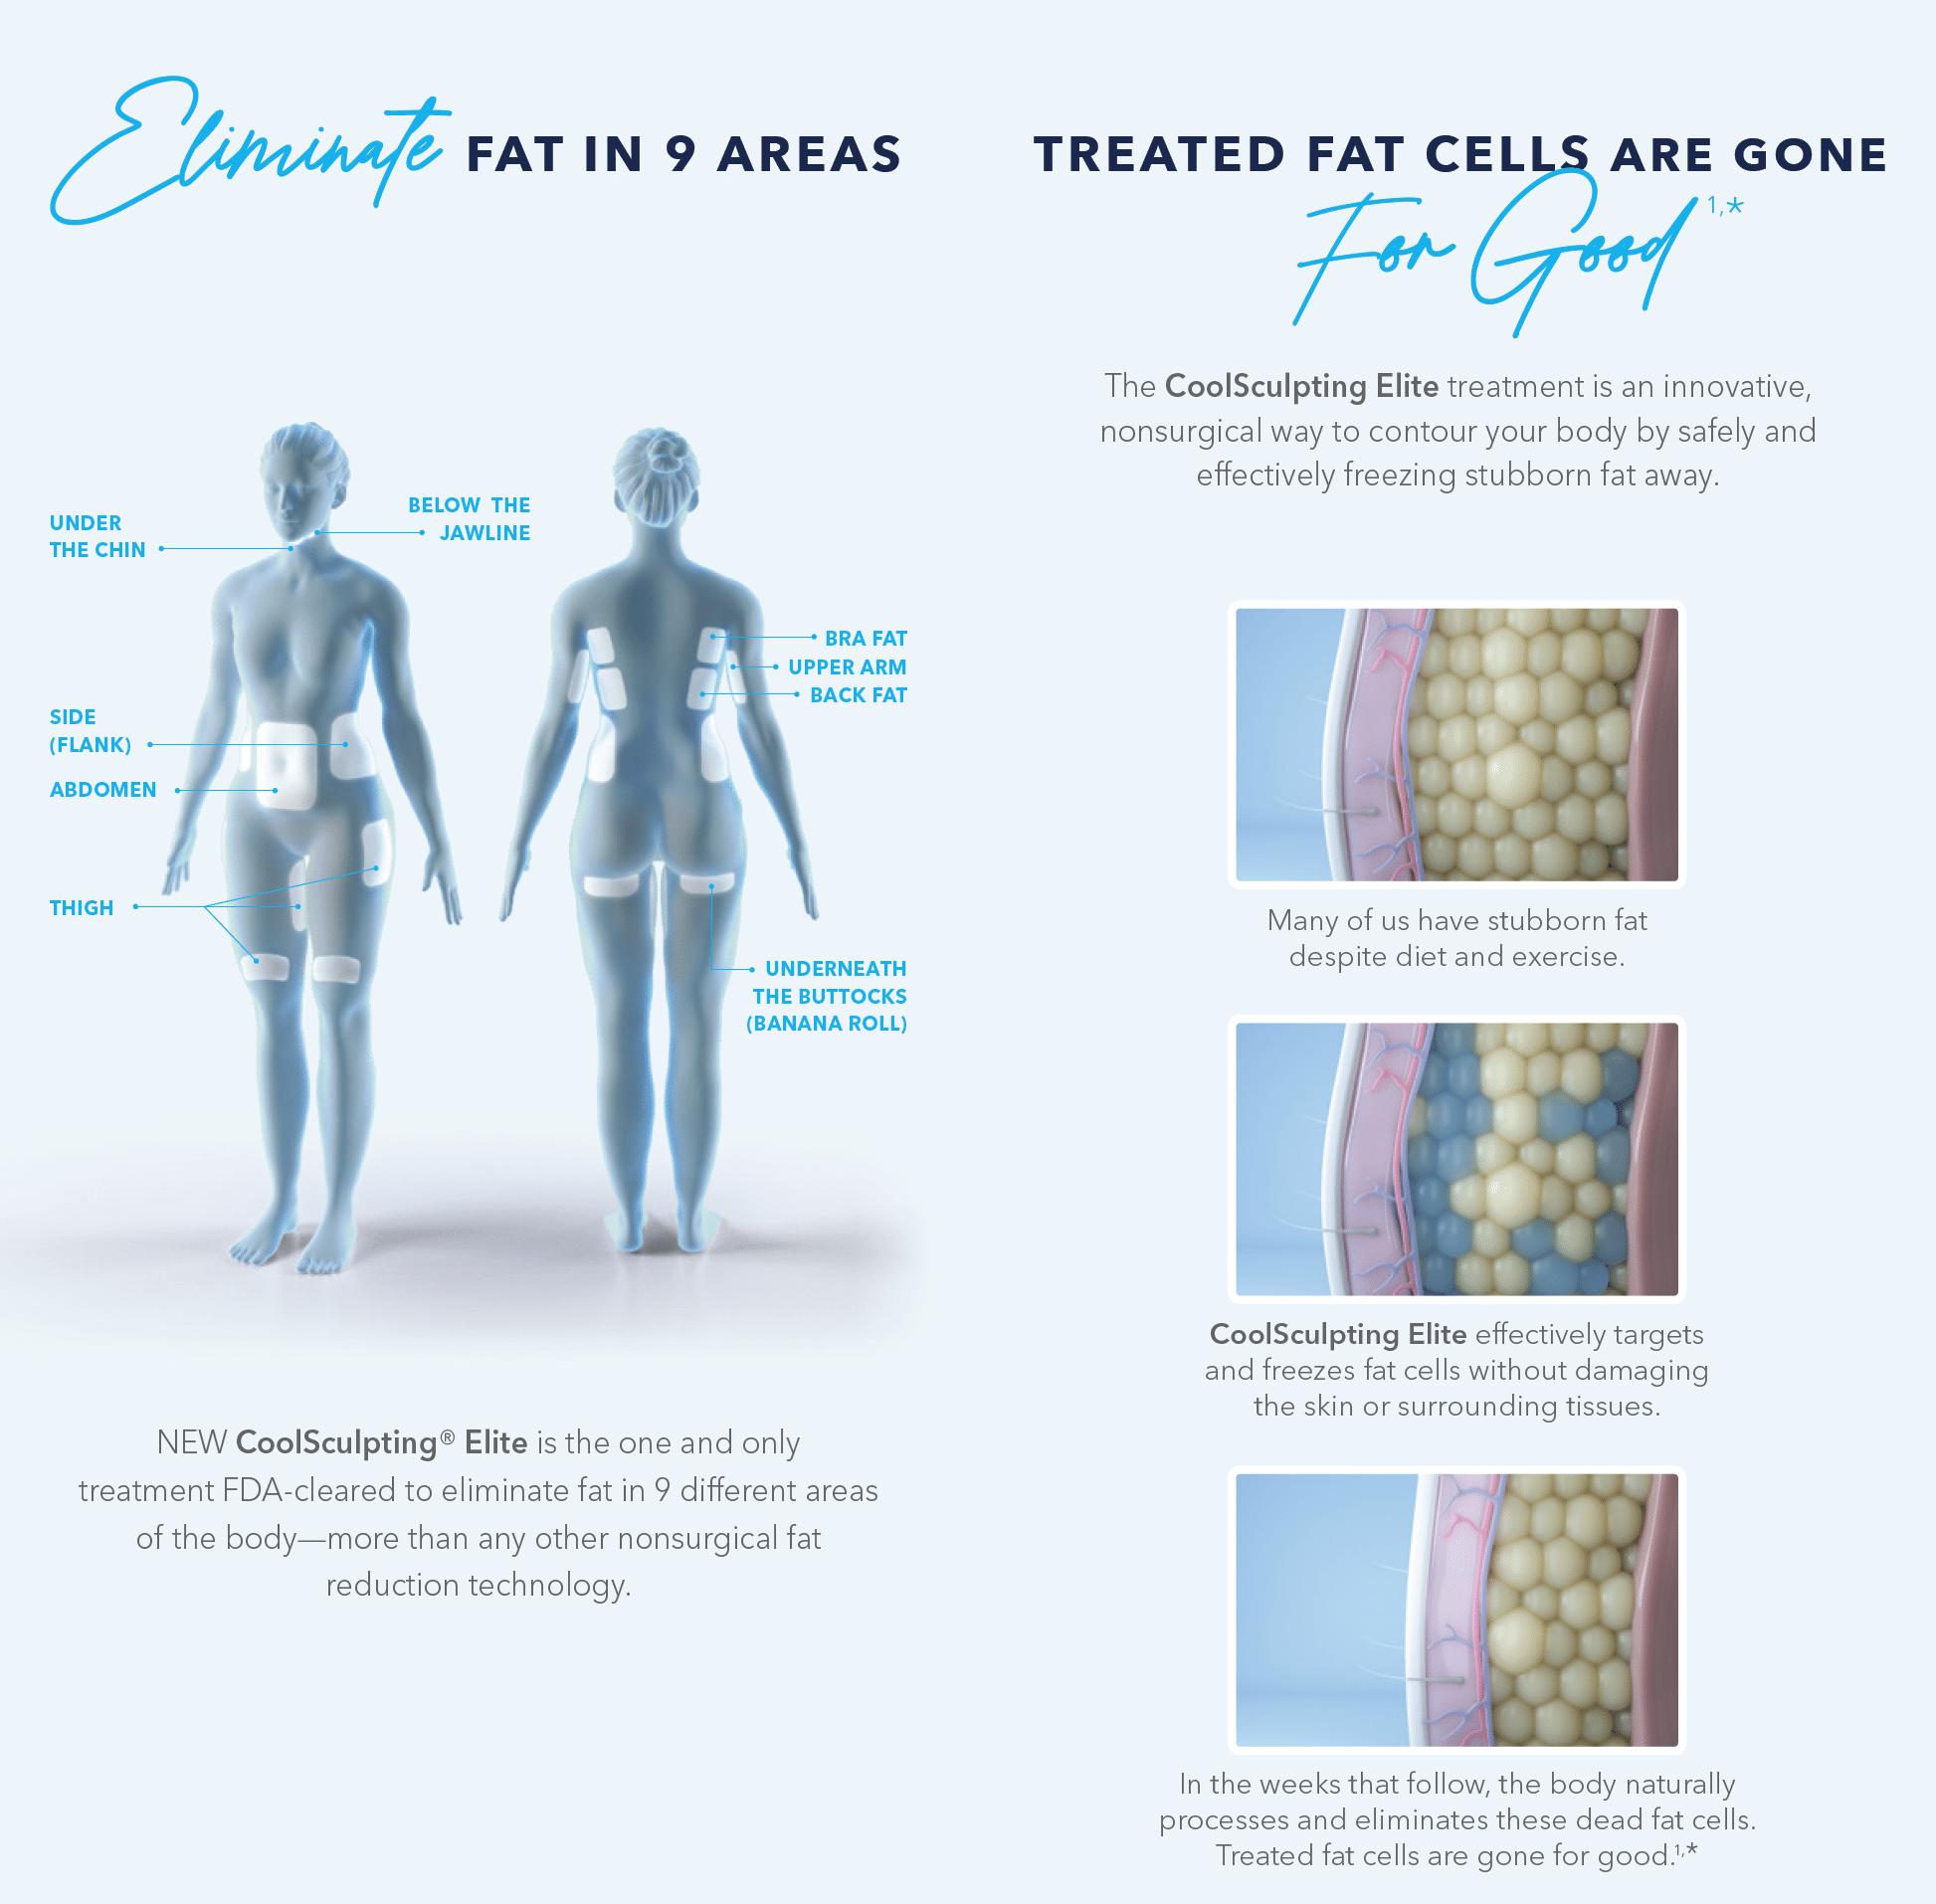 CoolSculpting elite eliminate fat cells